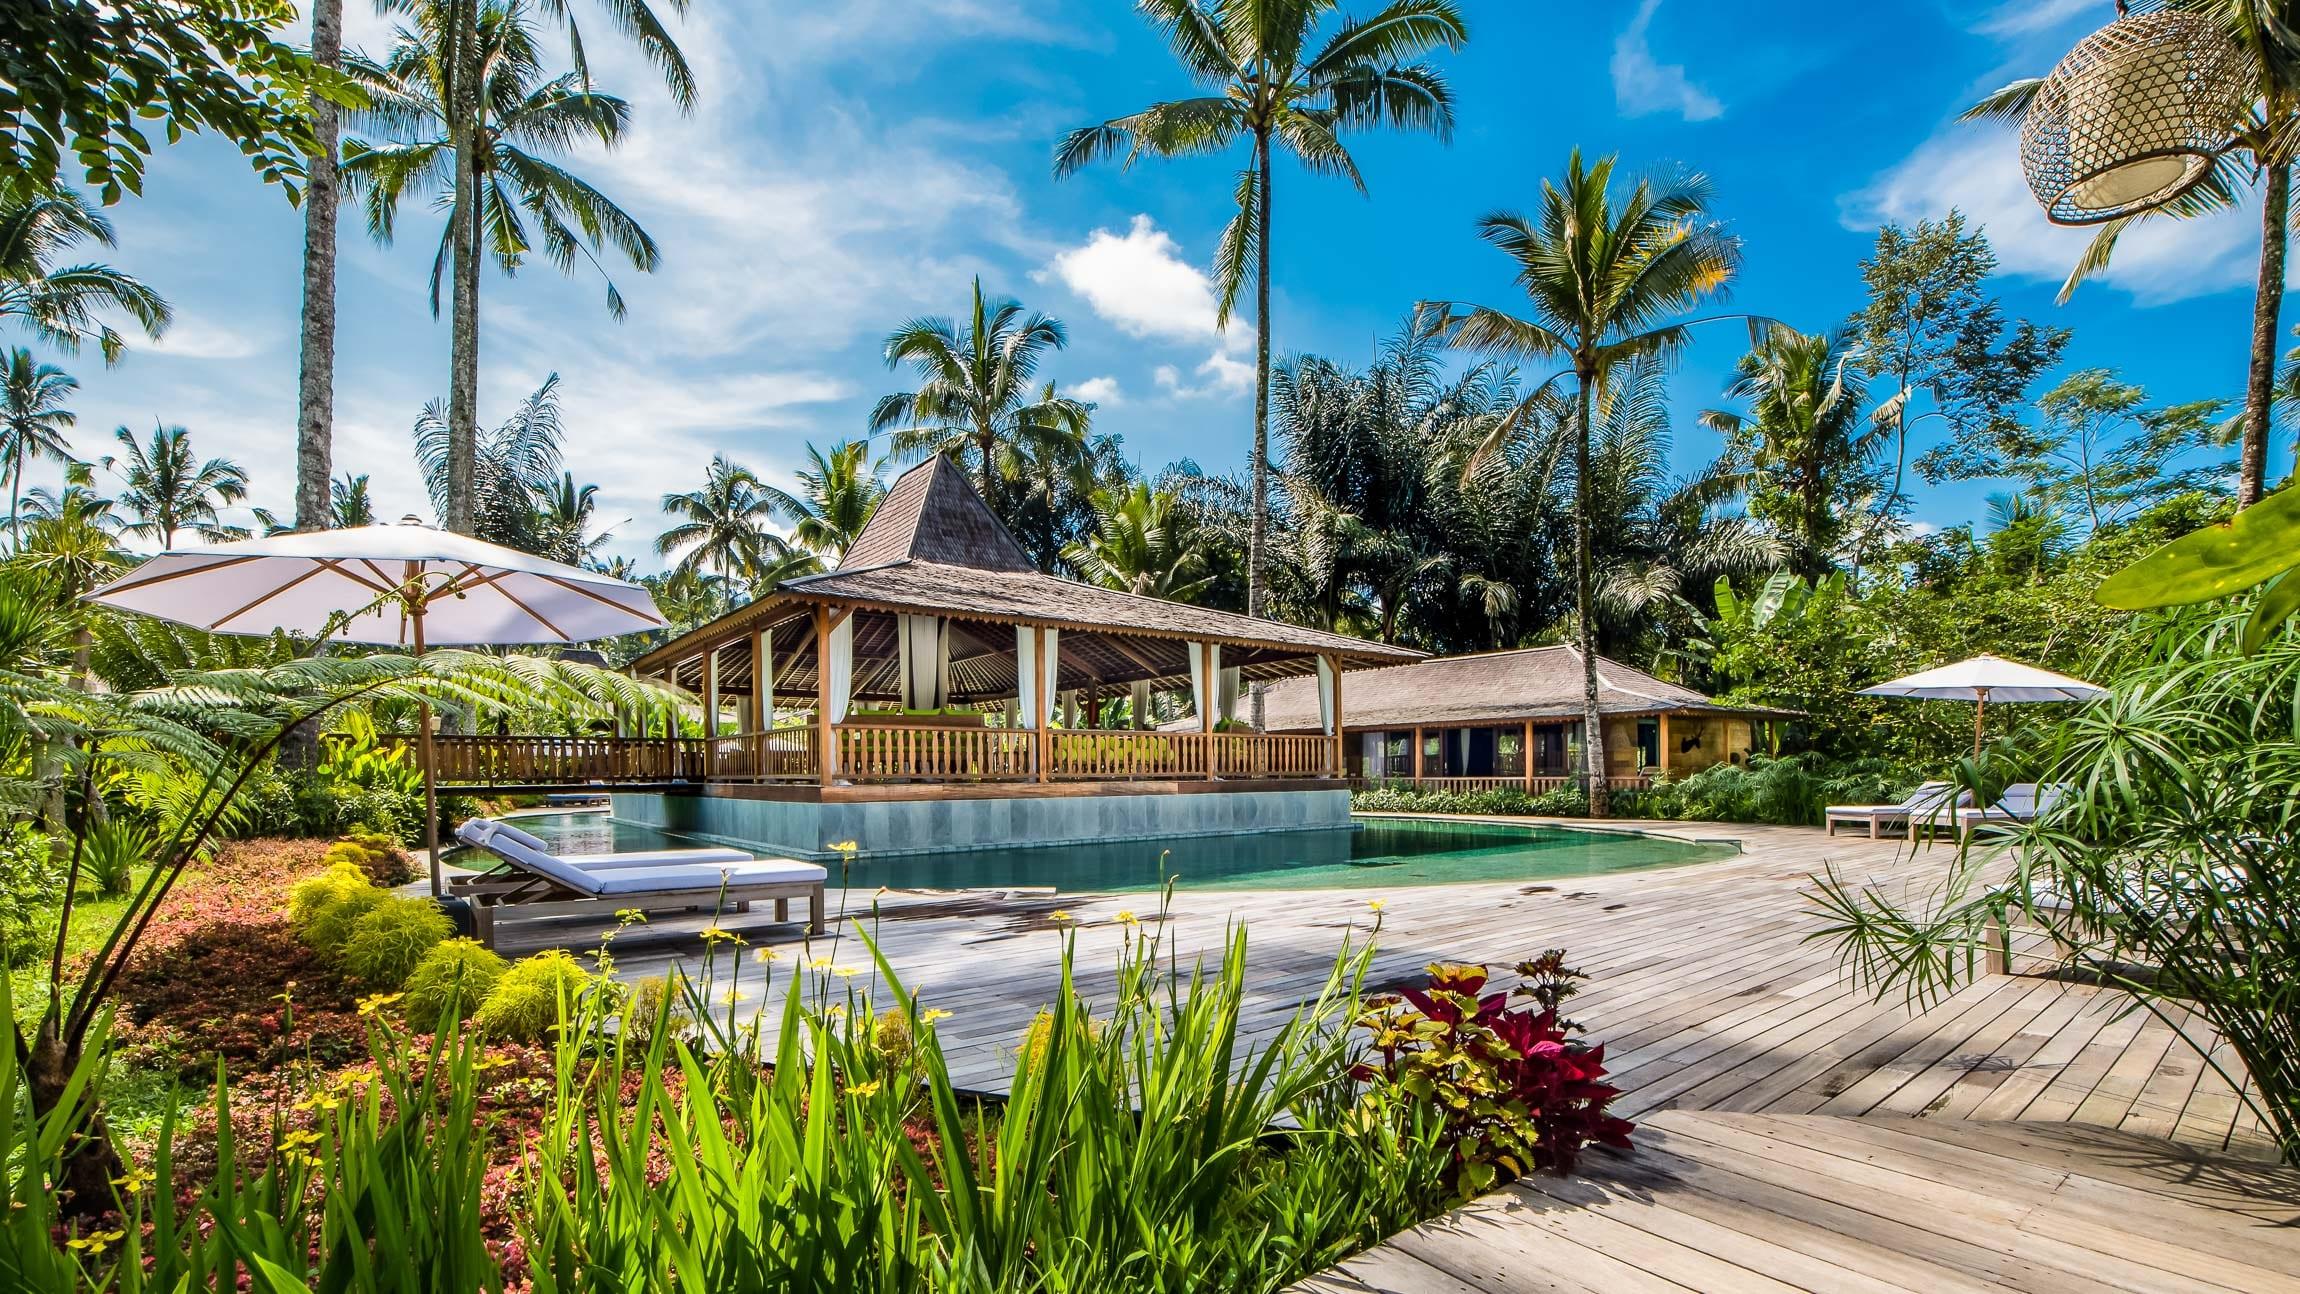 Villa Nag Shampa - Ubud, Bali, Indonesia